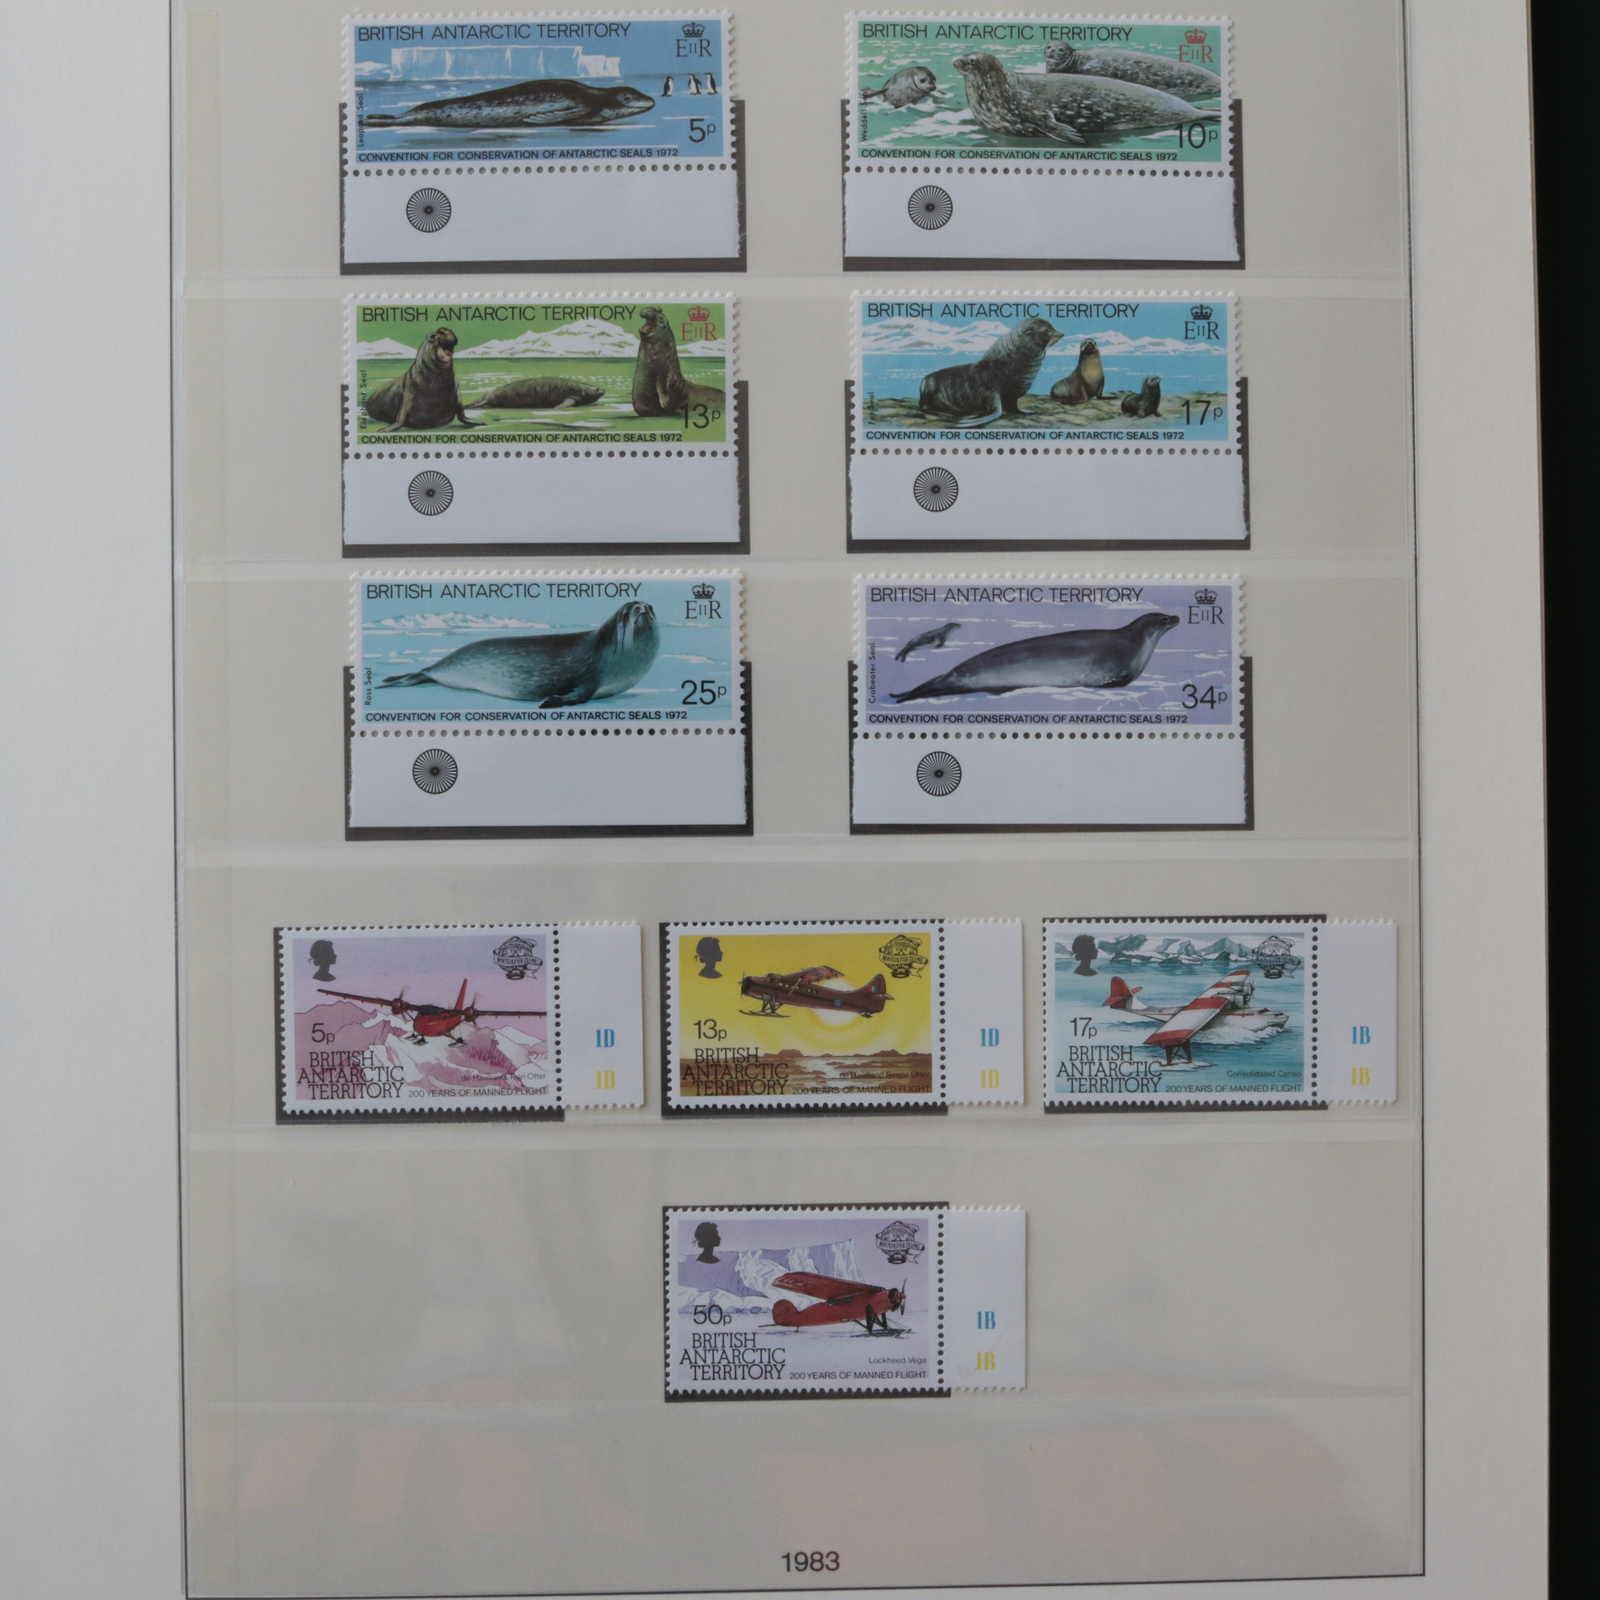 Lot 848 - Collections Louis Nicollin british antarctic territory -  Auktionshaus Schlegel 26 Public Auction